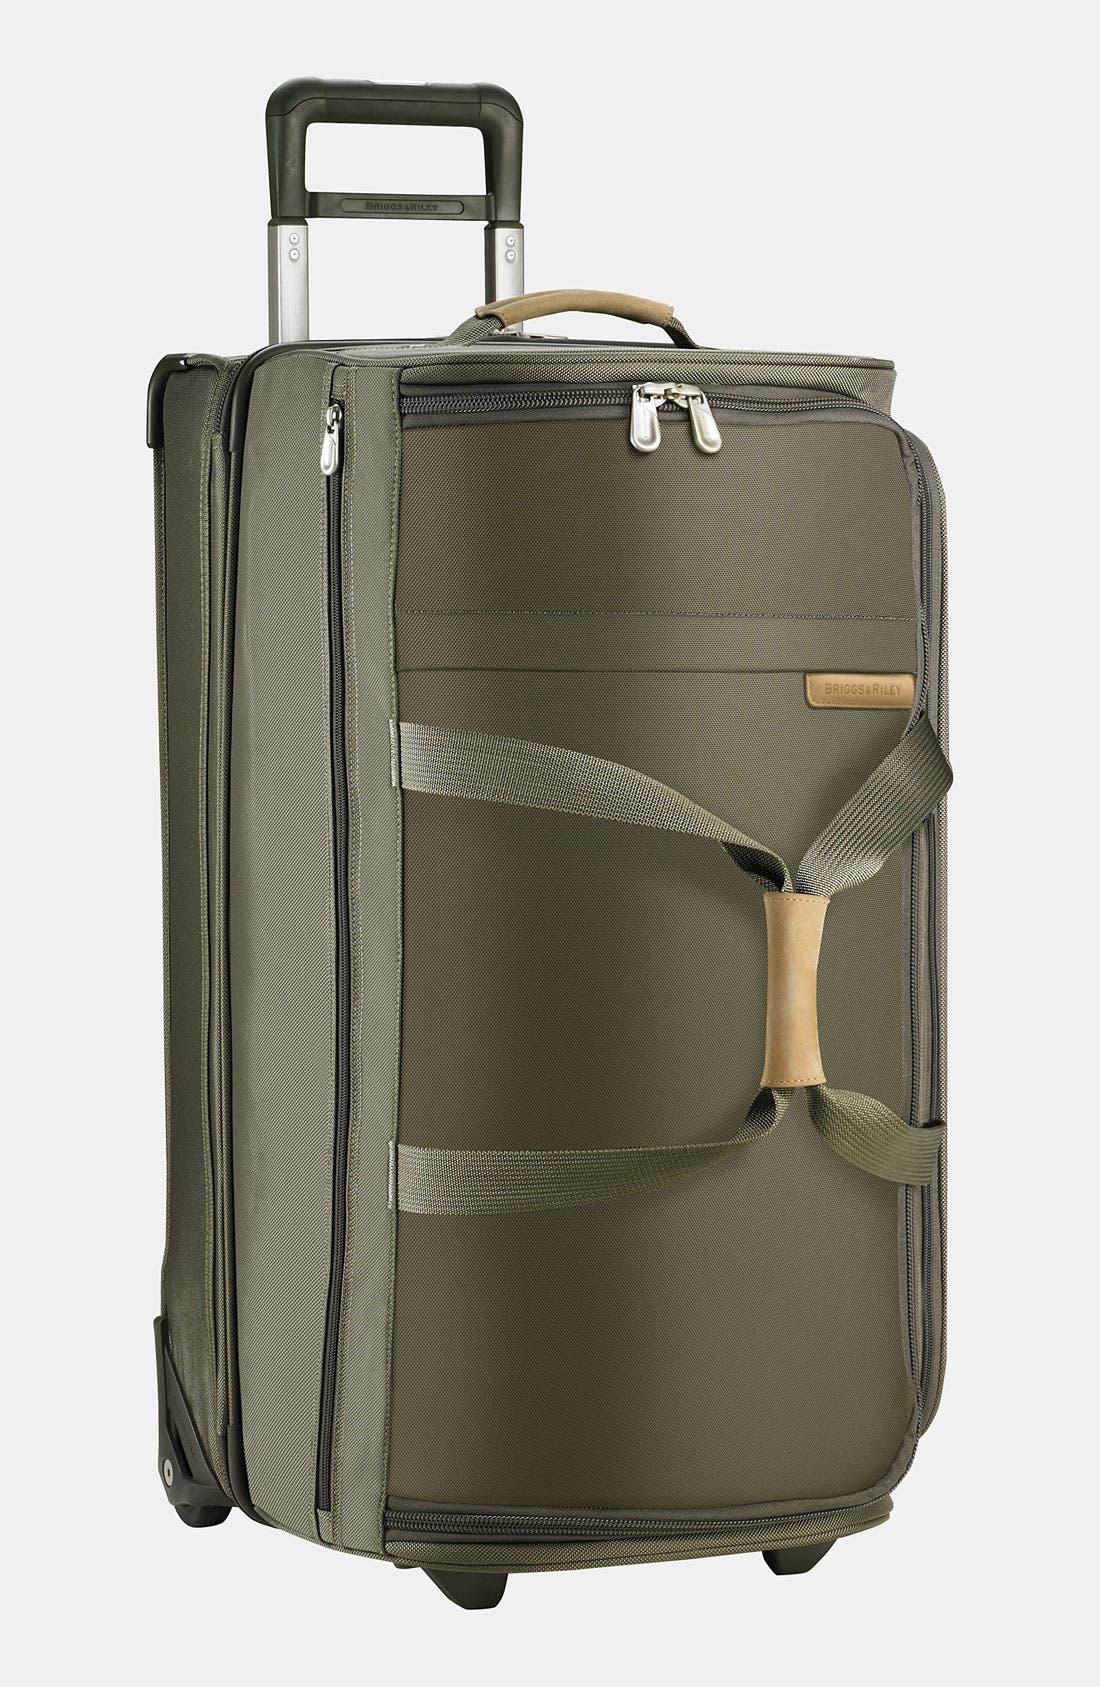 Main Image - Briggs & Riley 'Large Baseline' Rolling Duffel Bag (29 Inch)